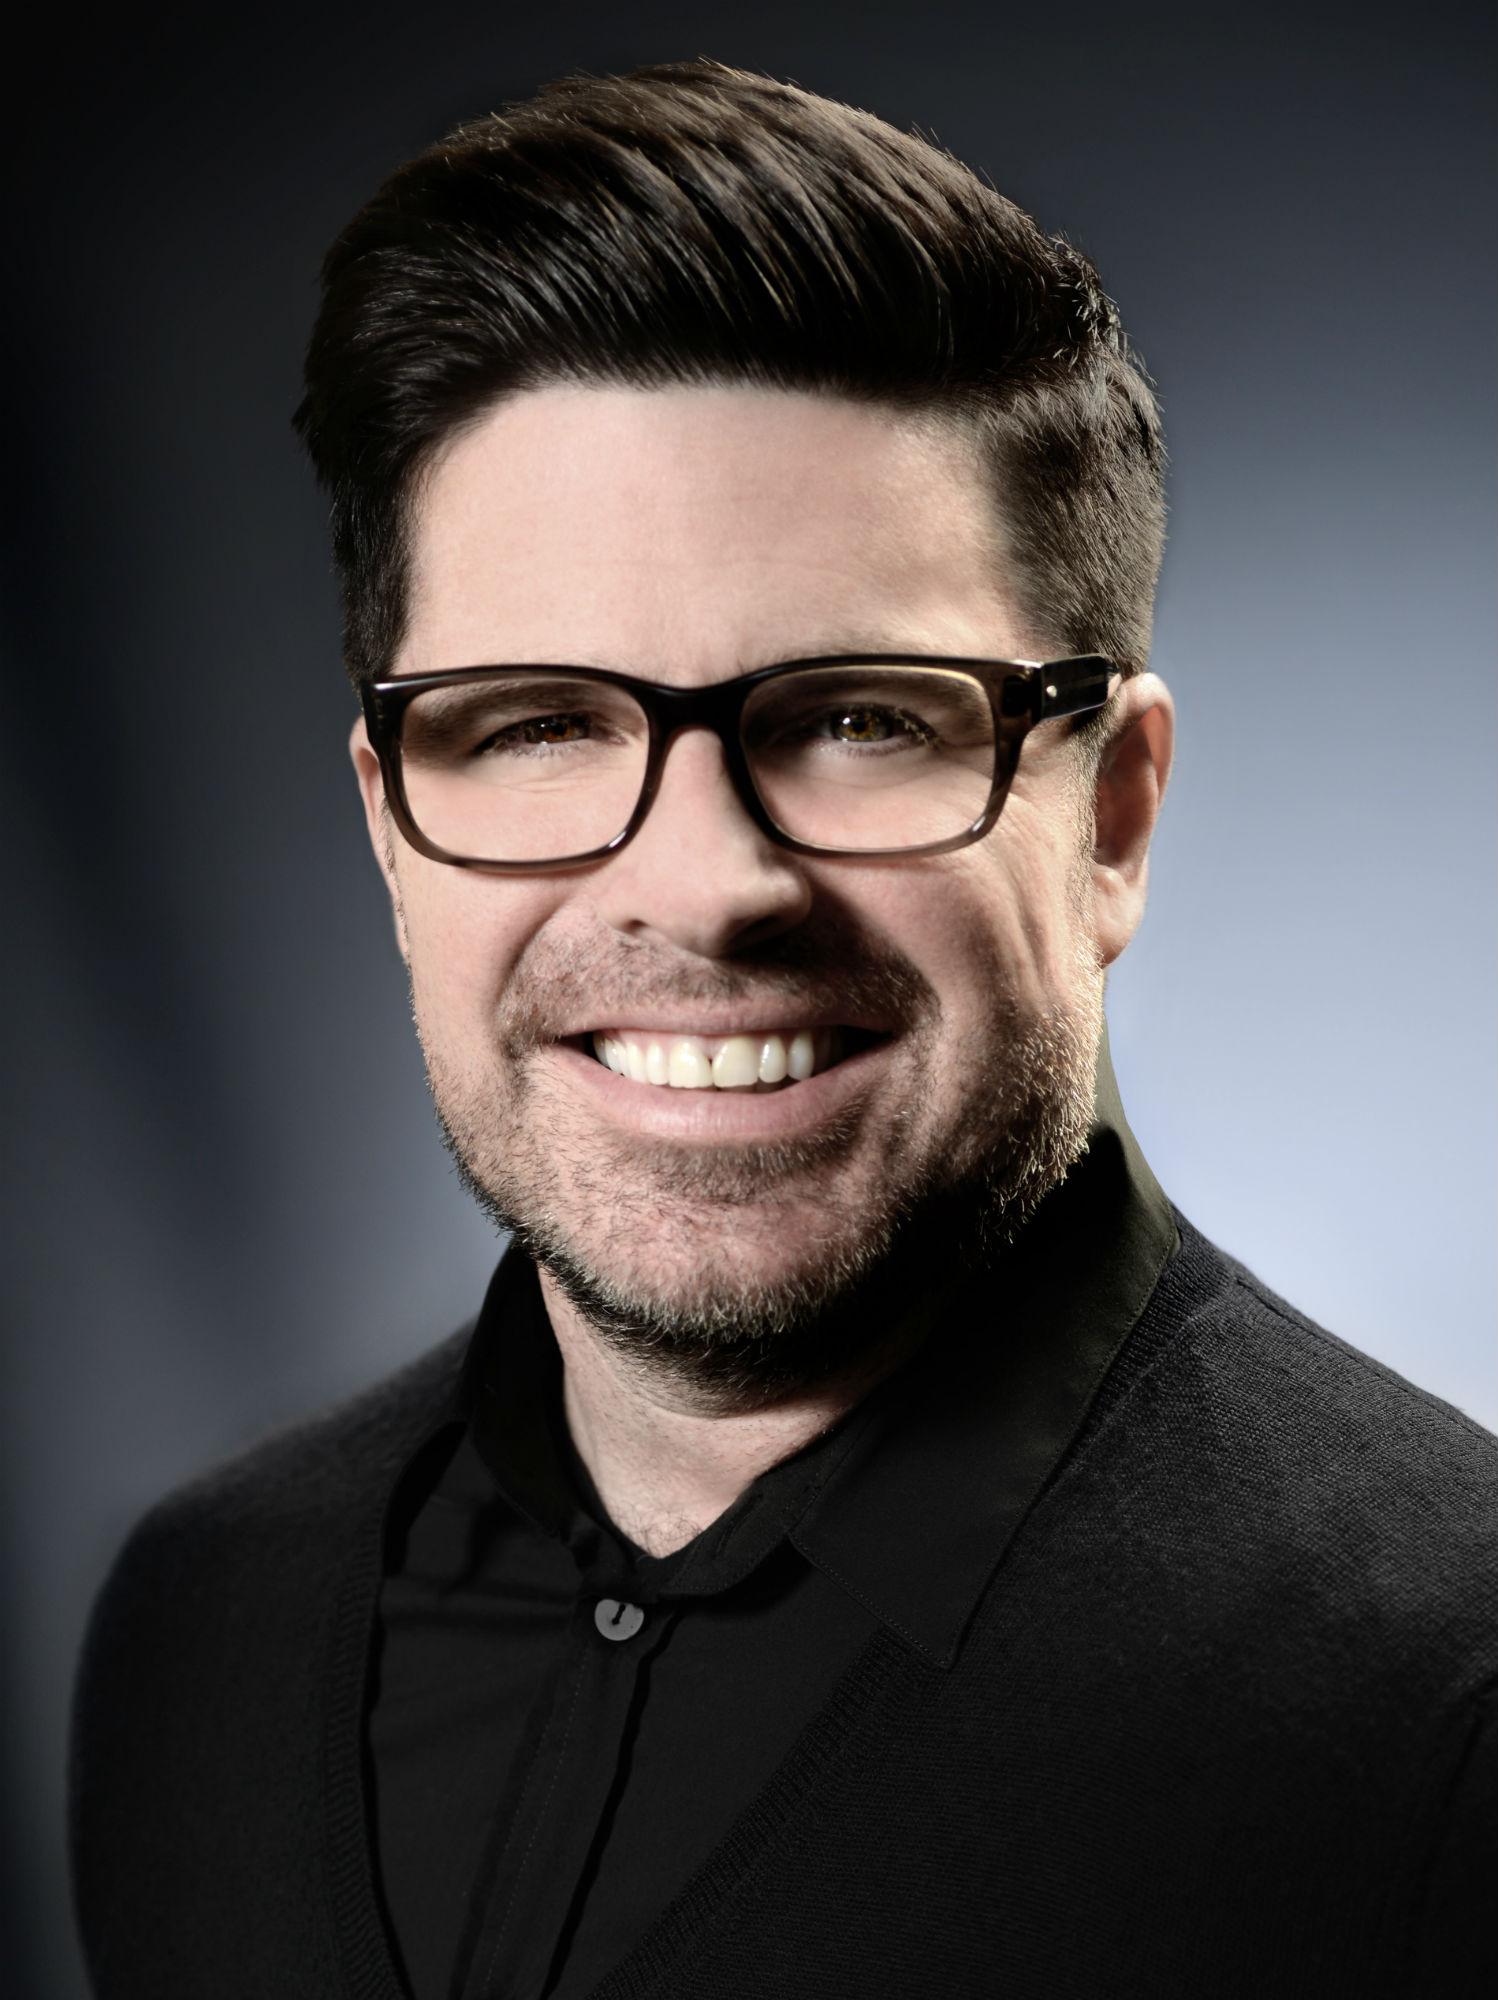 Michael Shaun Corby